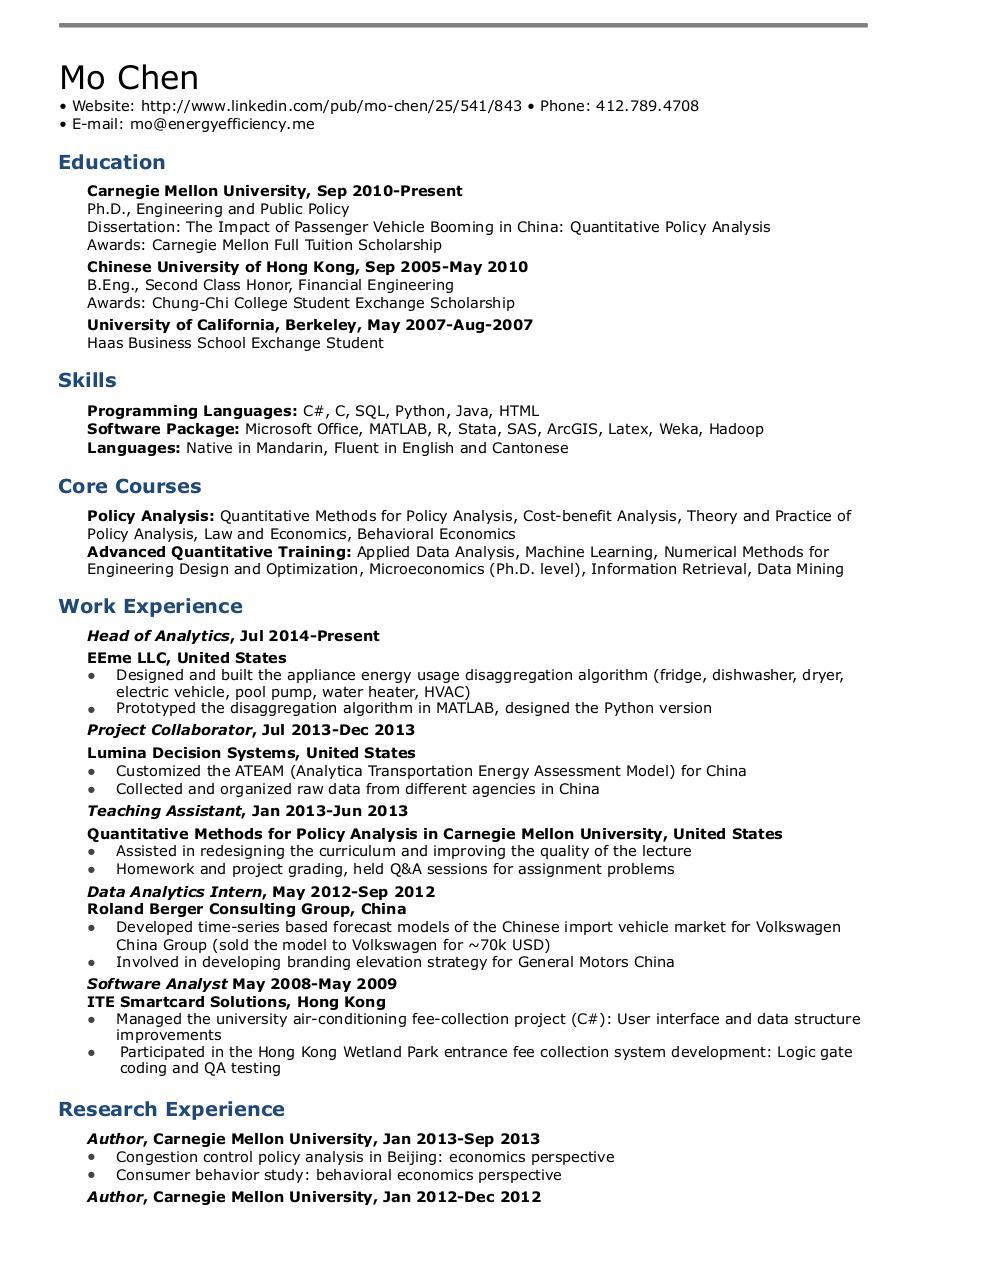 Resume MoChen - PDF Archive